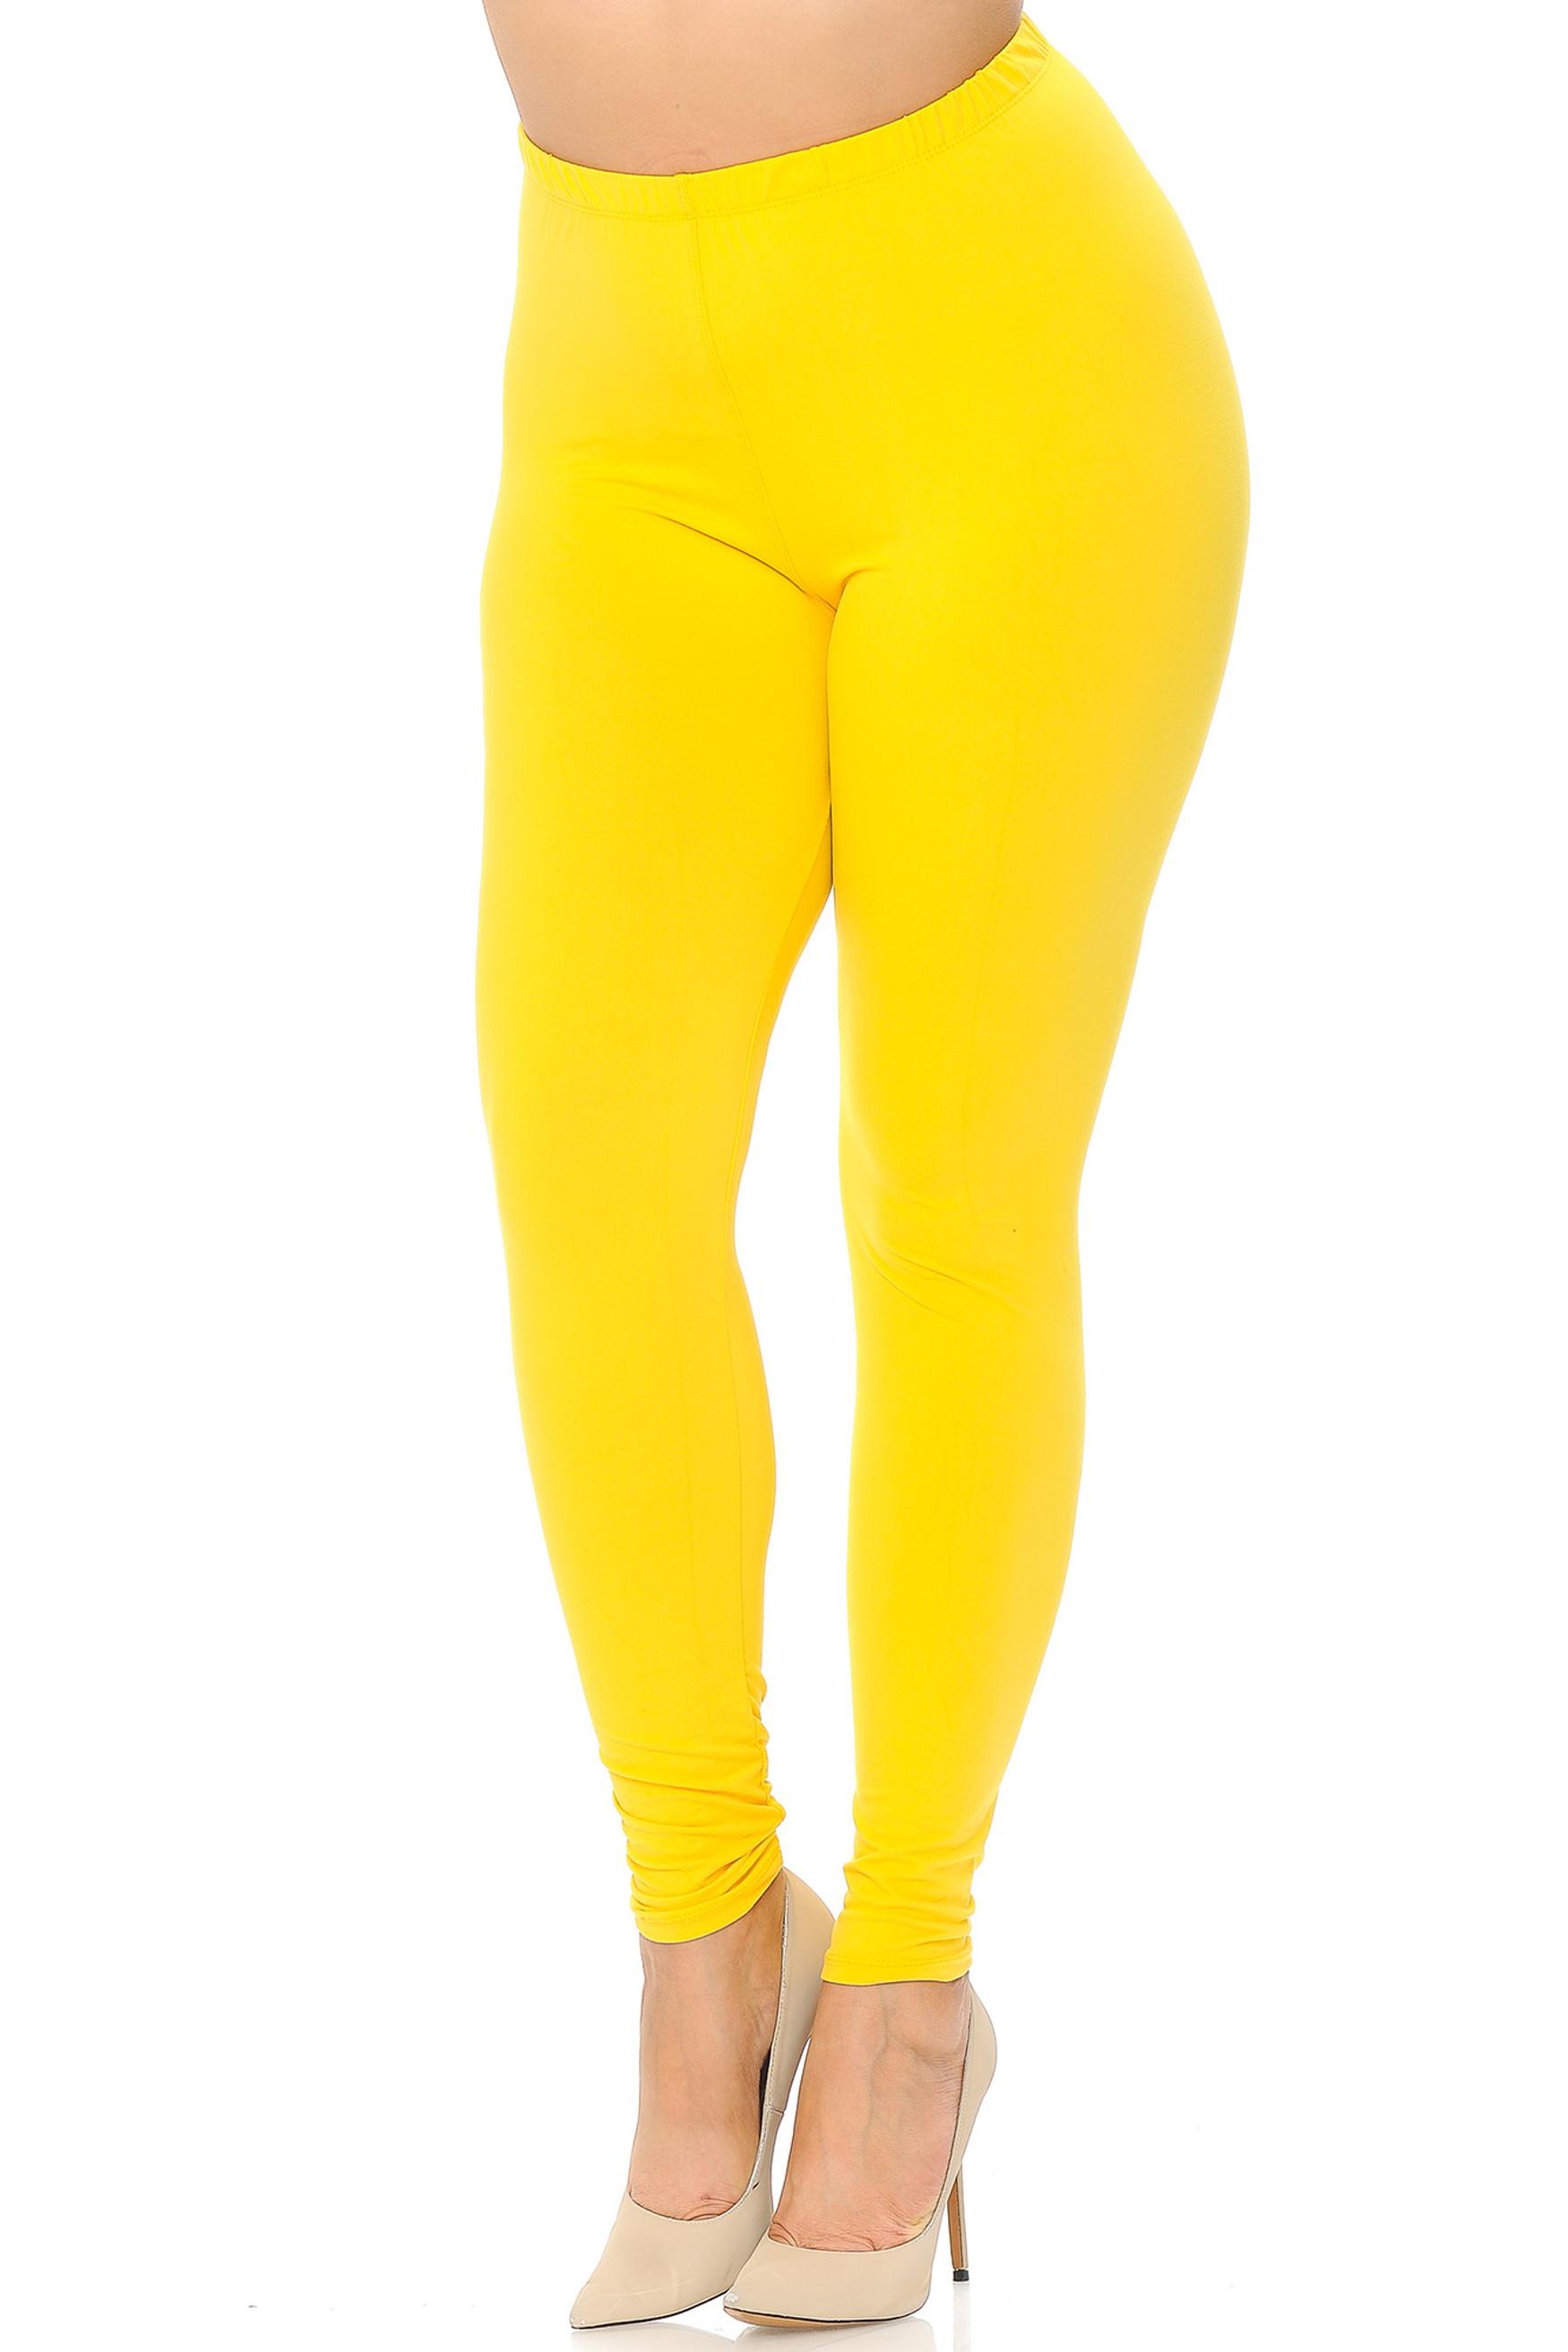 Yellow Main Brushed Basic Solid Plus Size Leggings - EEVEE